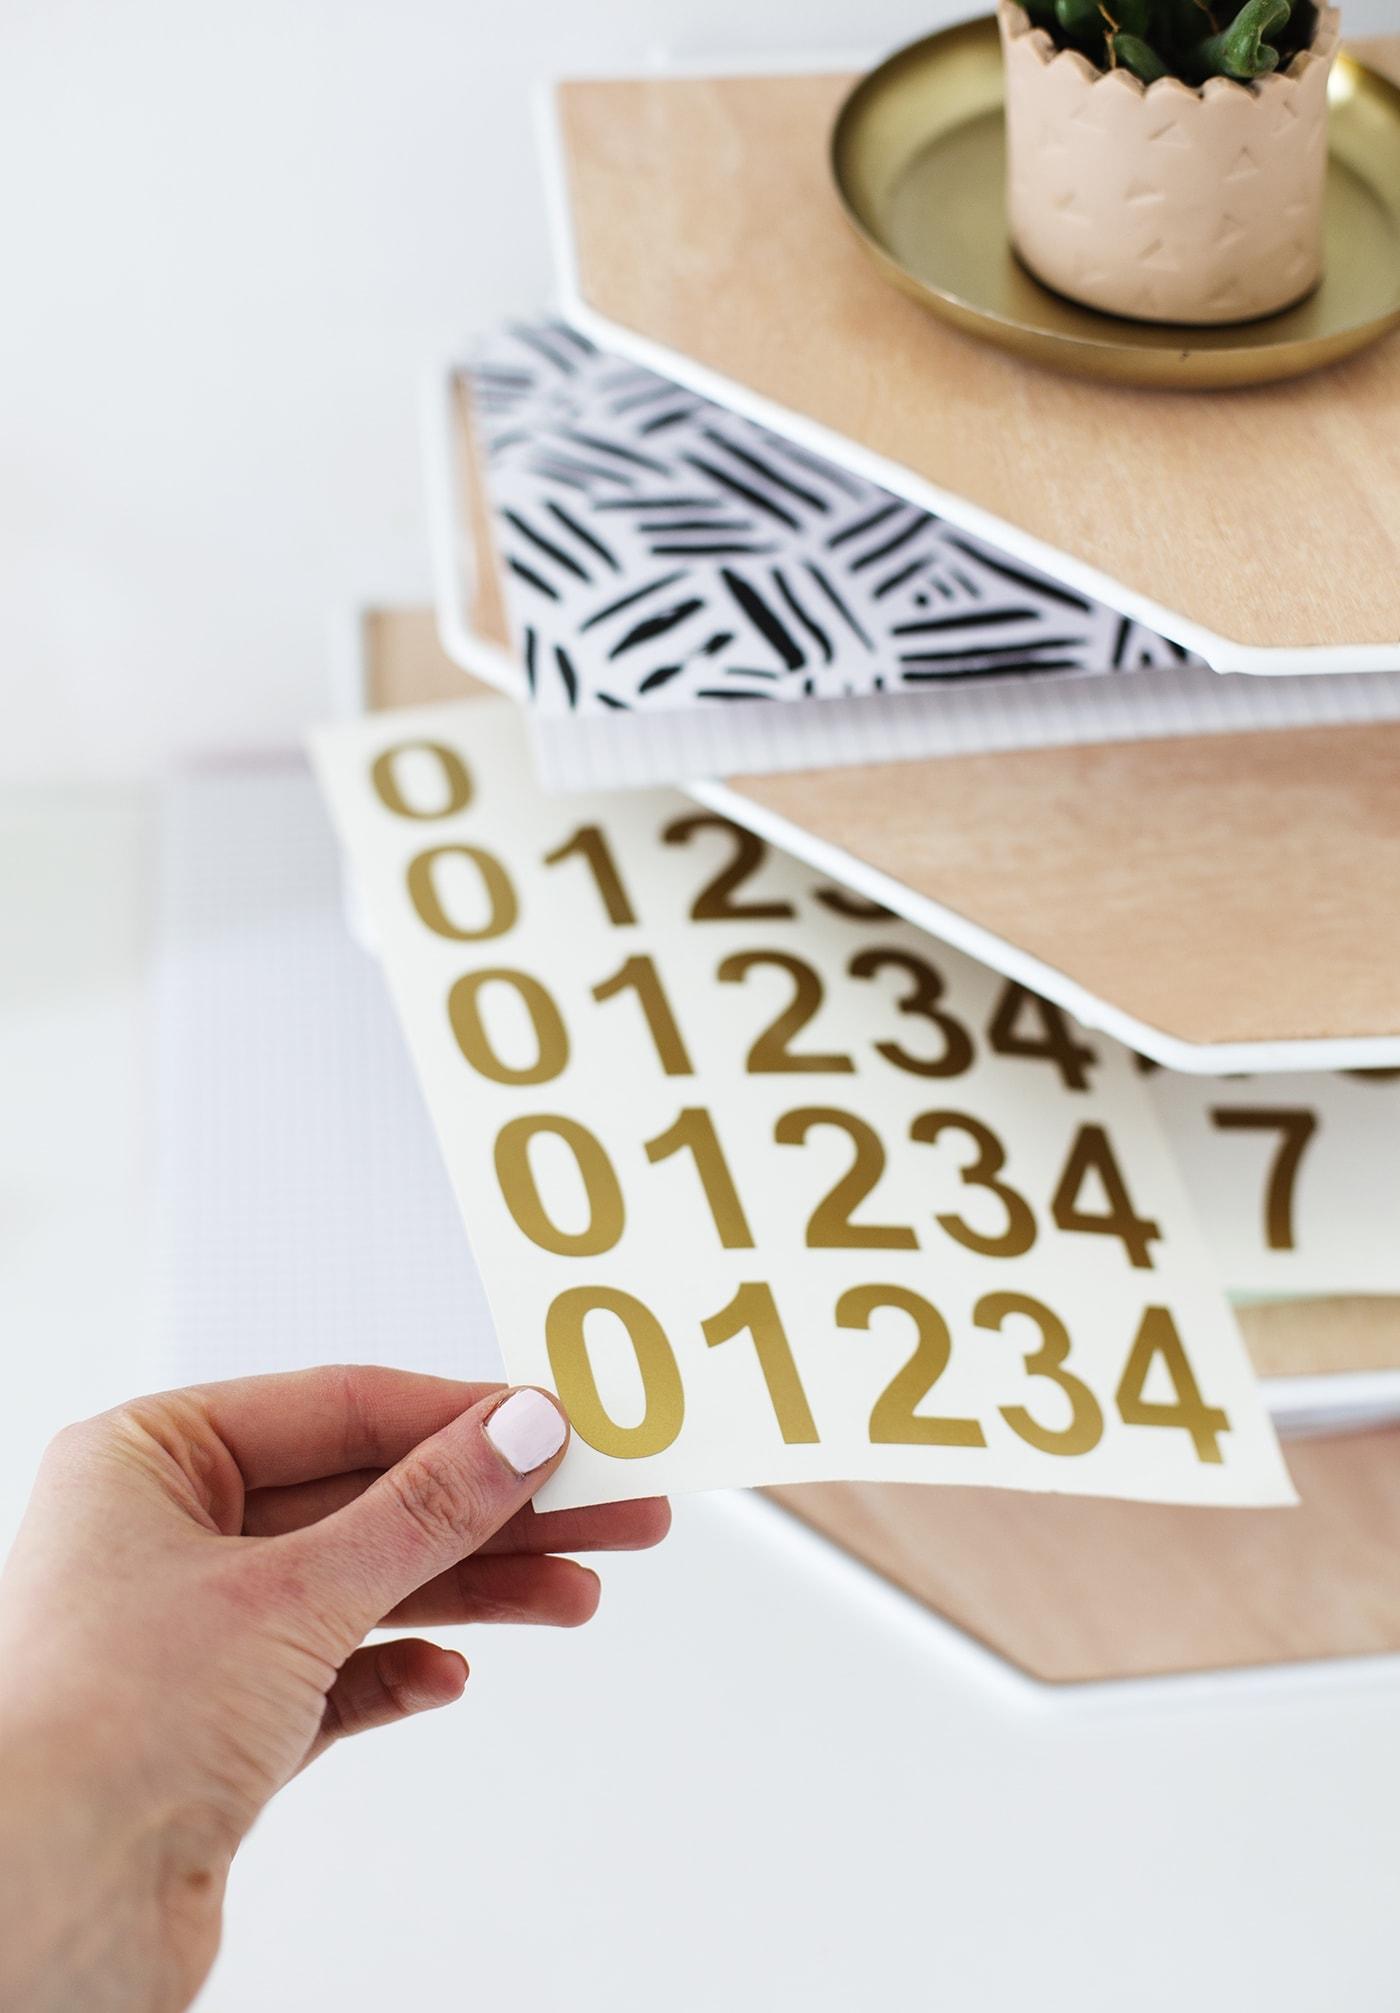 DIY balsa wood desk organiser tutorial | workspace tidy up | easy craft ideas